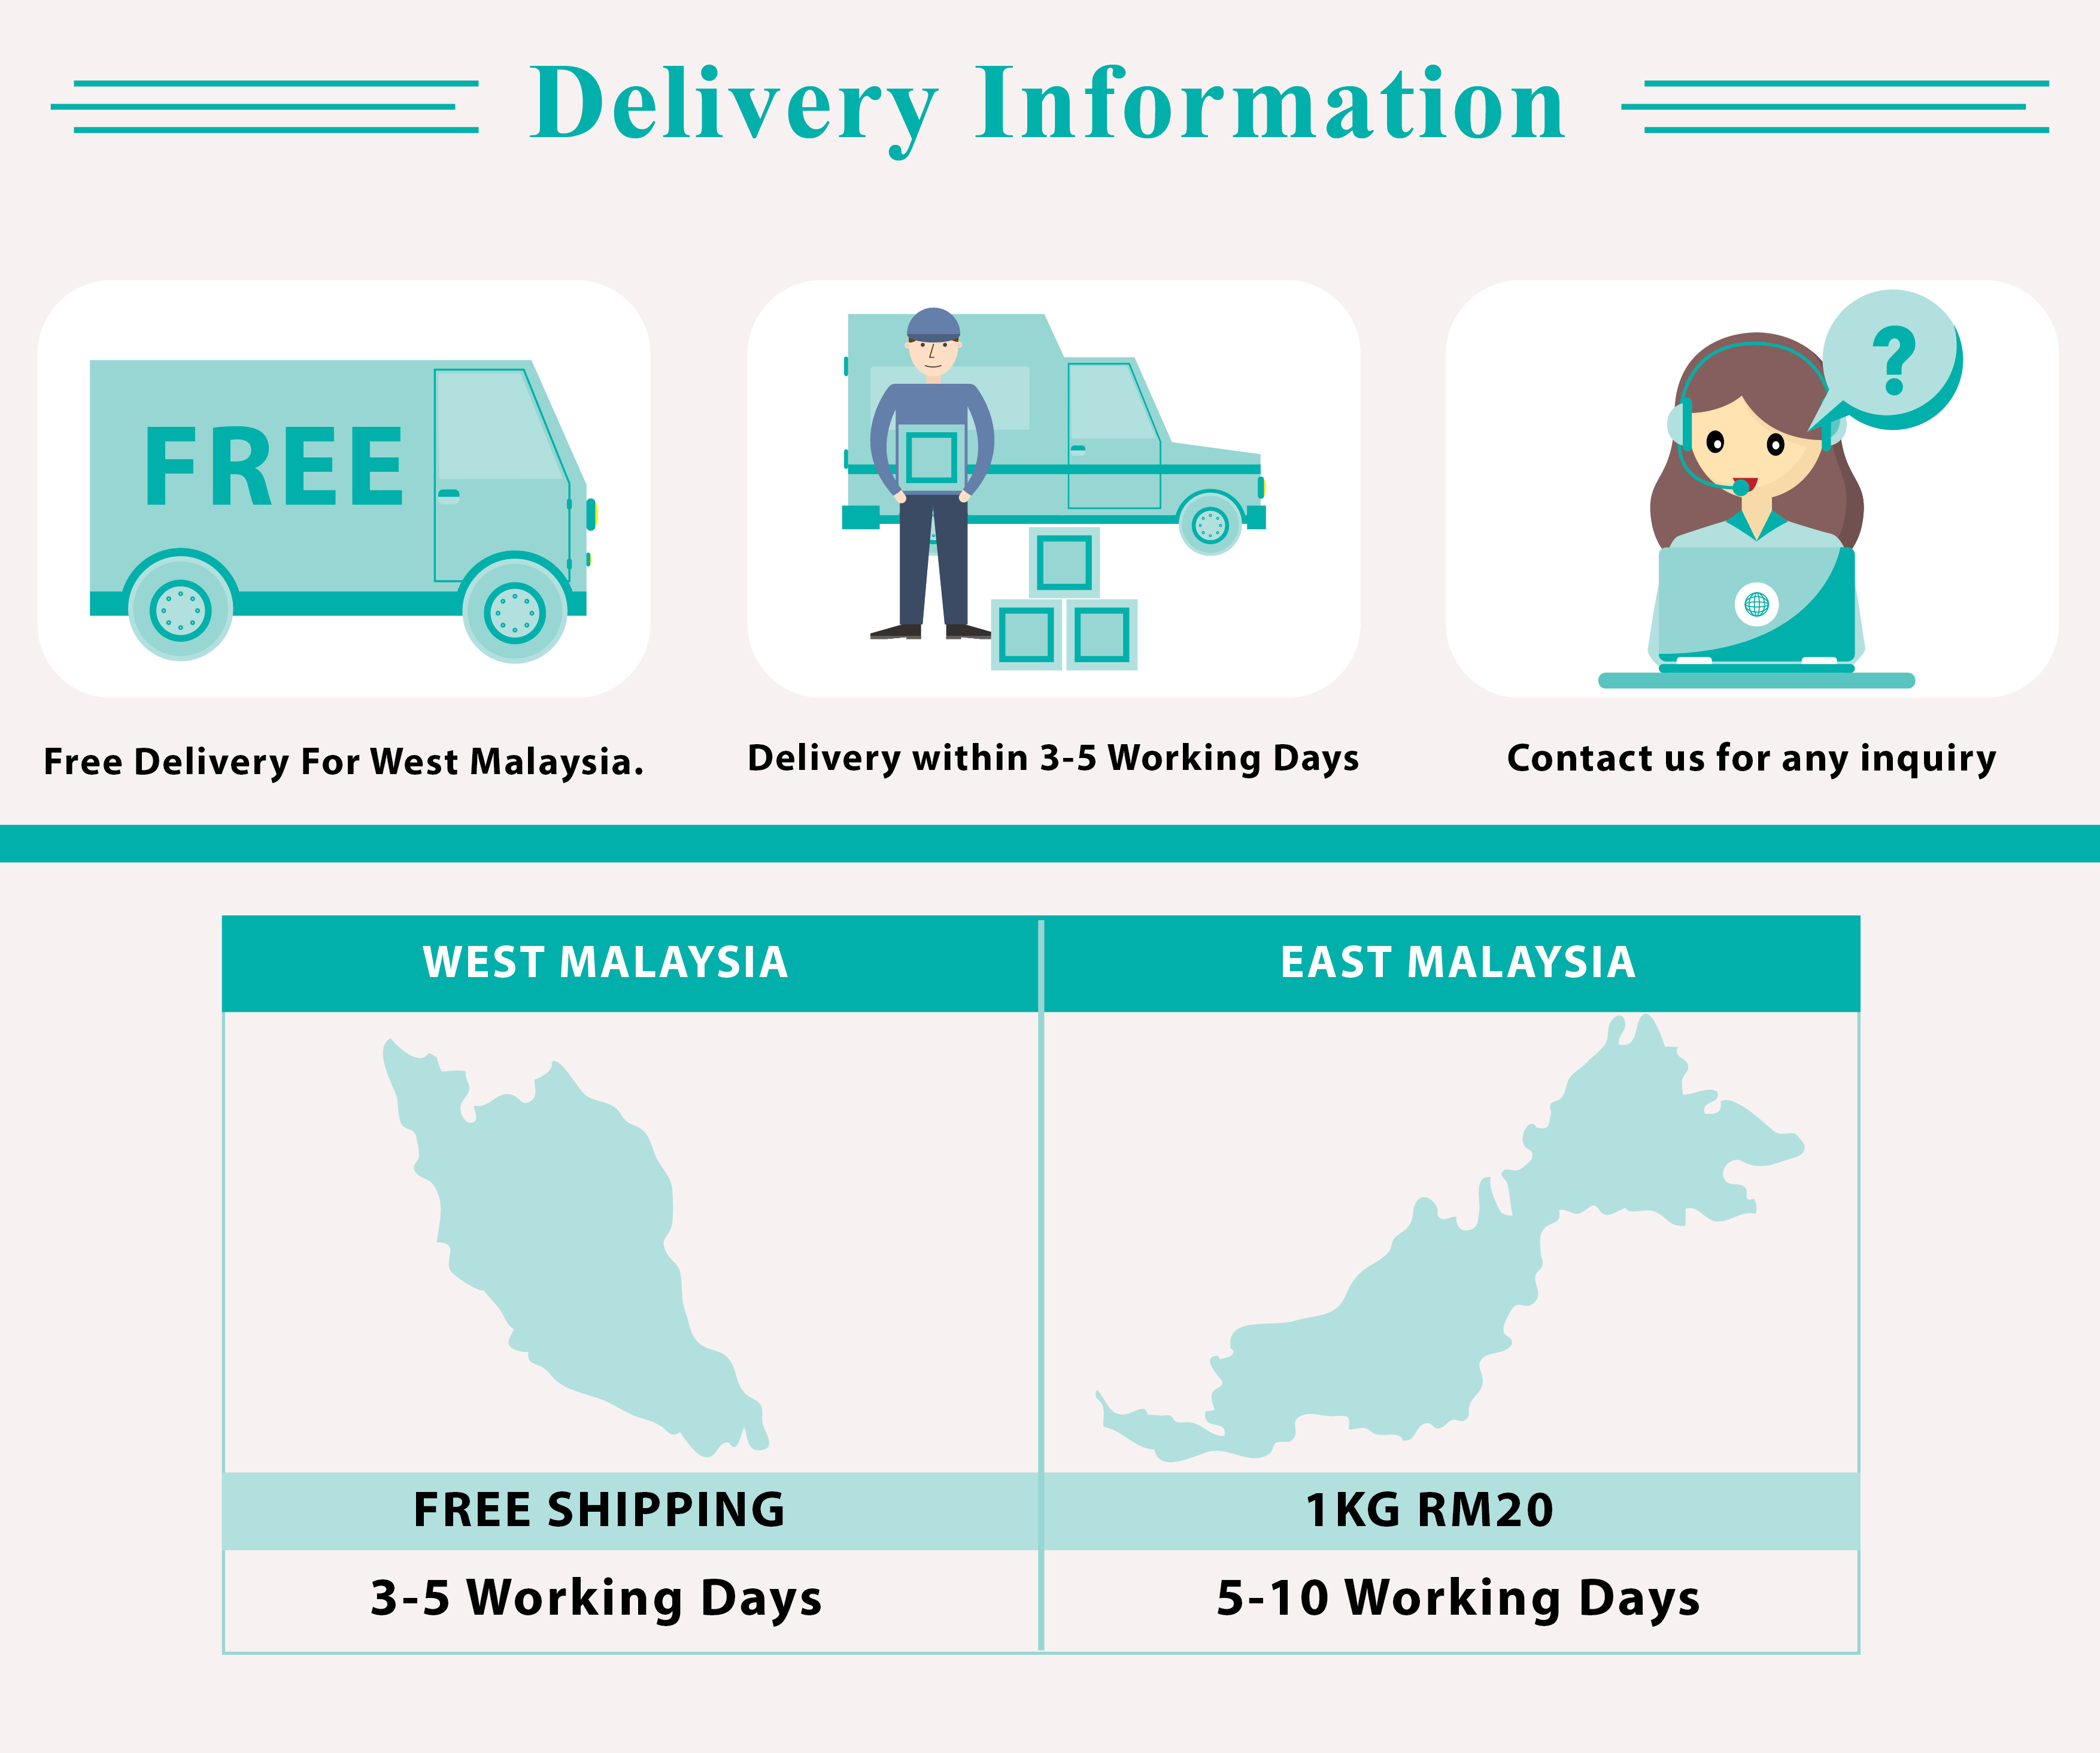 https://thetravelstore.com.my/media/wysiwyg/Delivery_Information-01.jpg